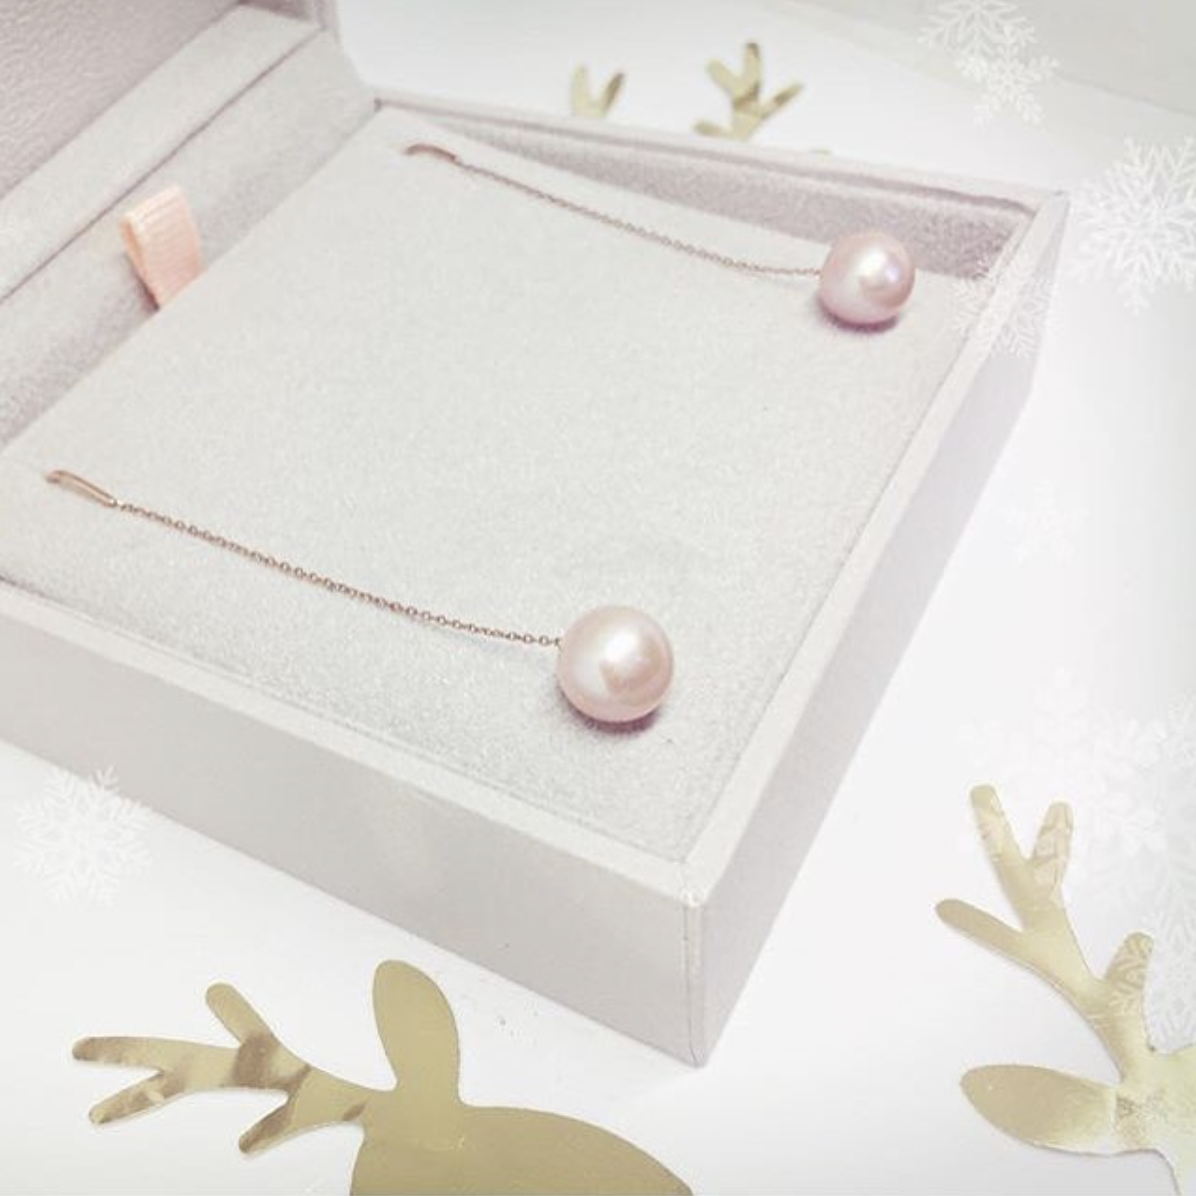 collier perle guerin